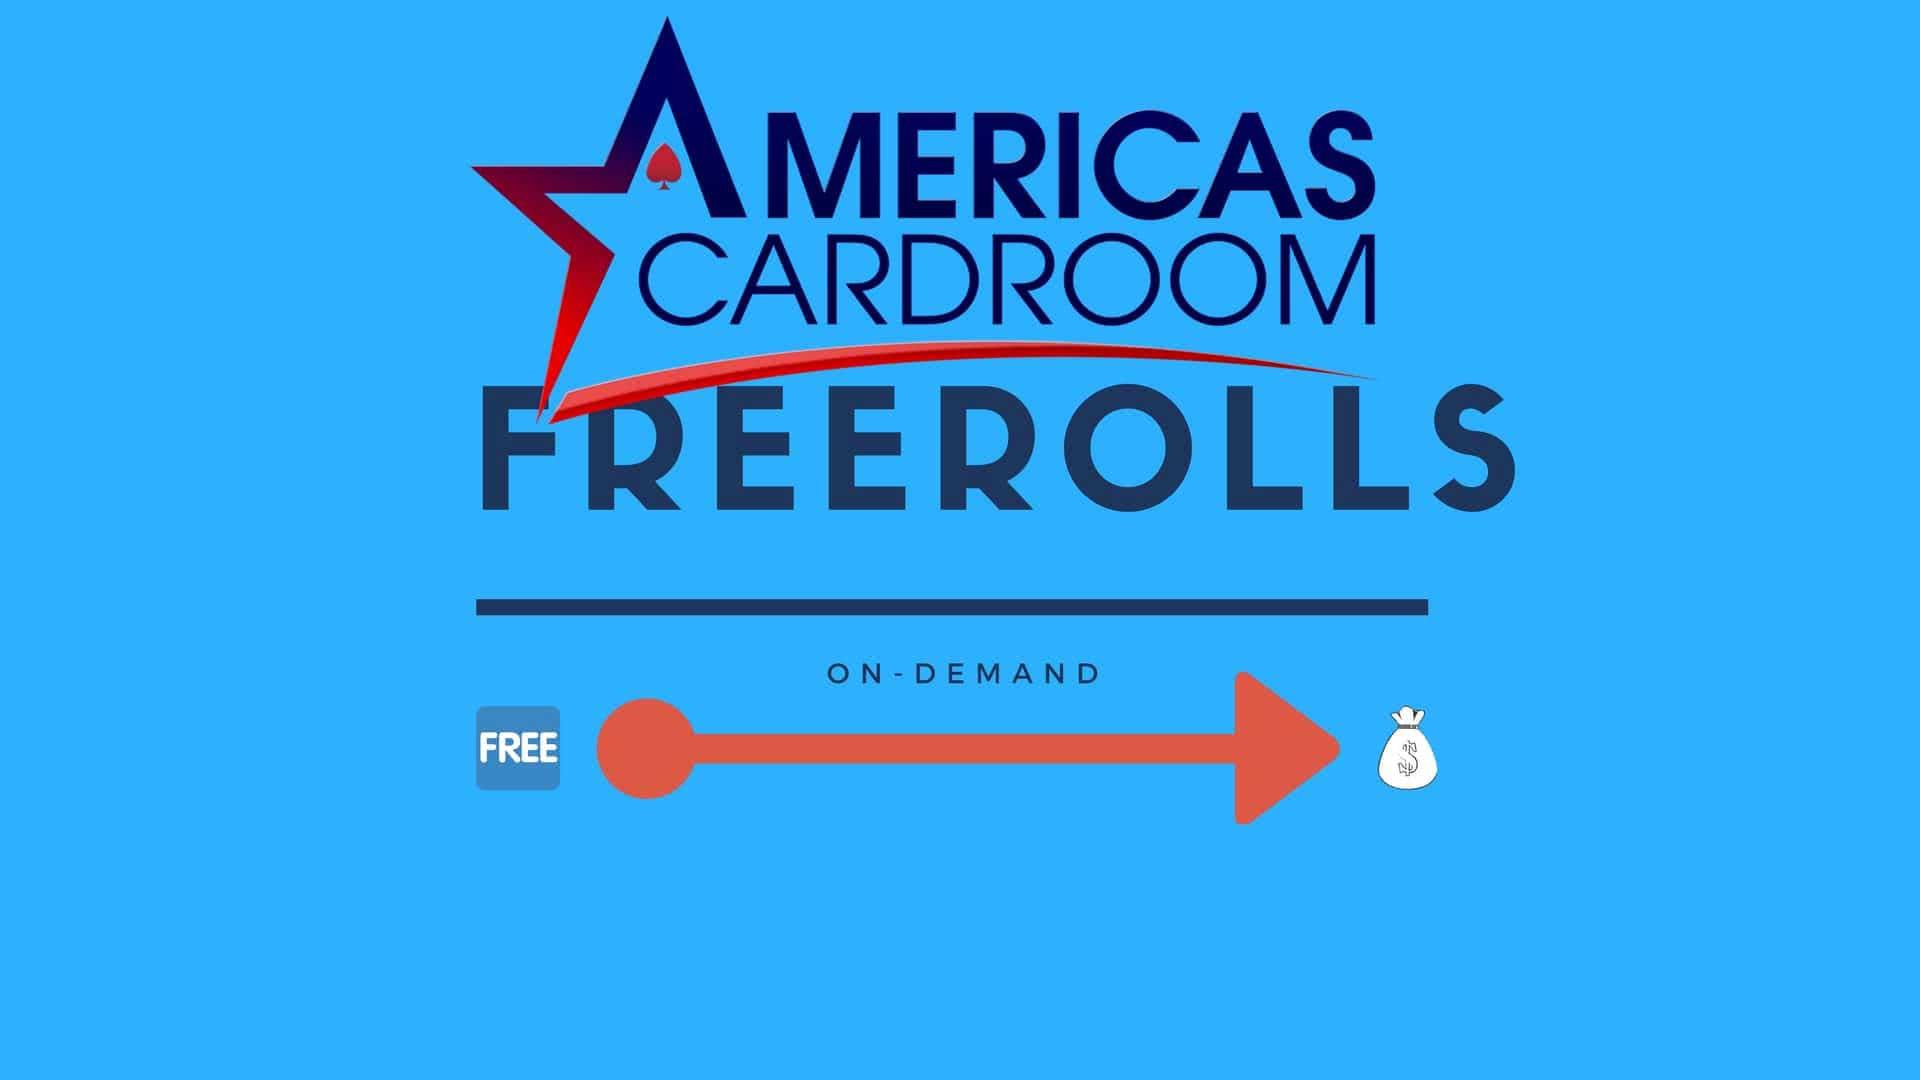 Americas Cardroom freerolls